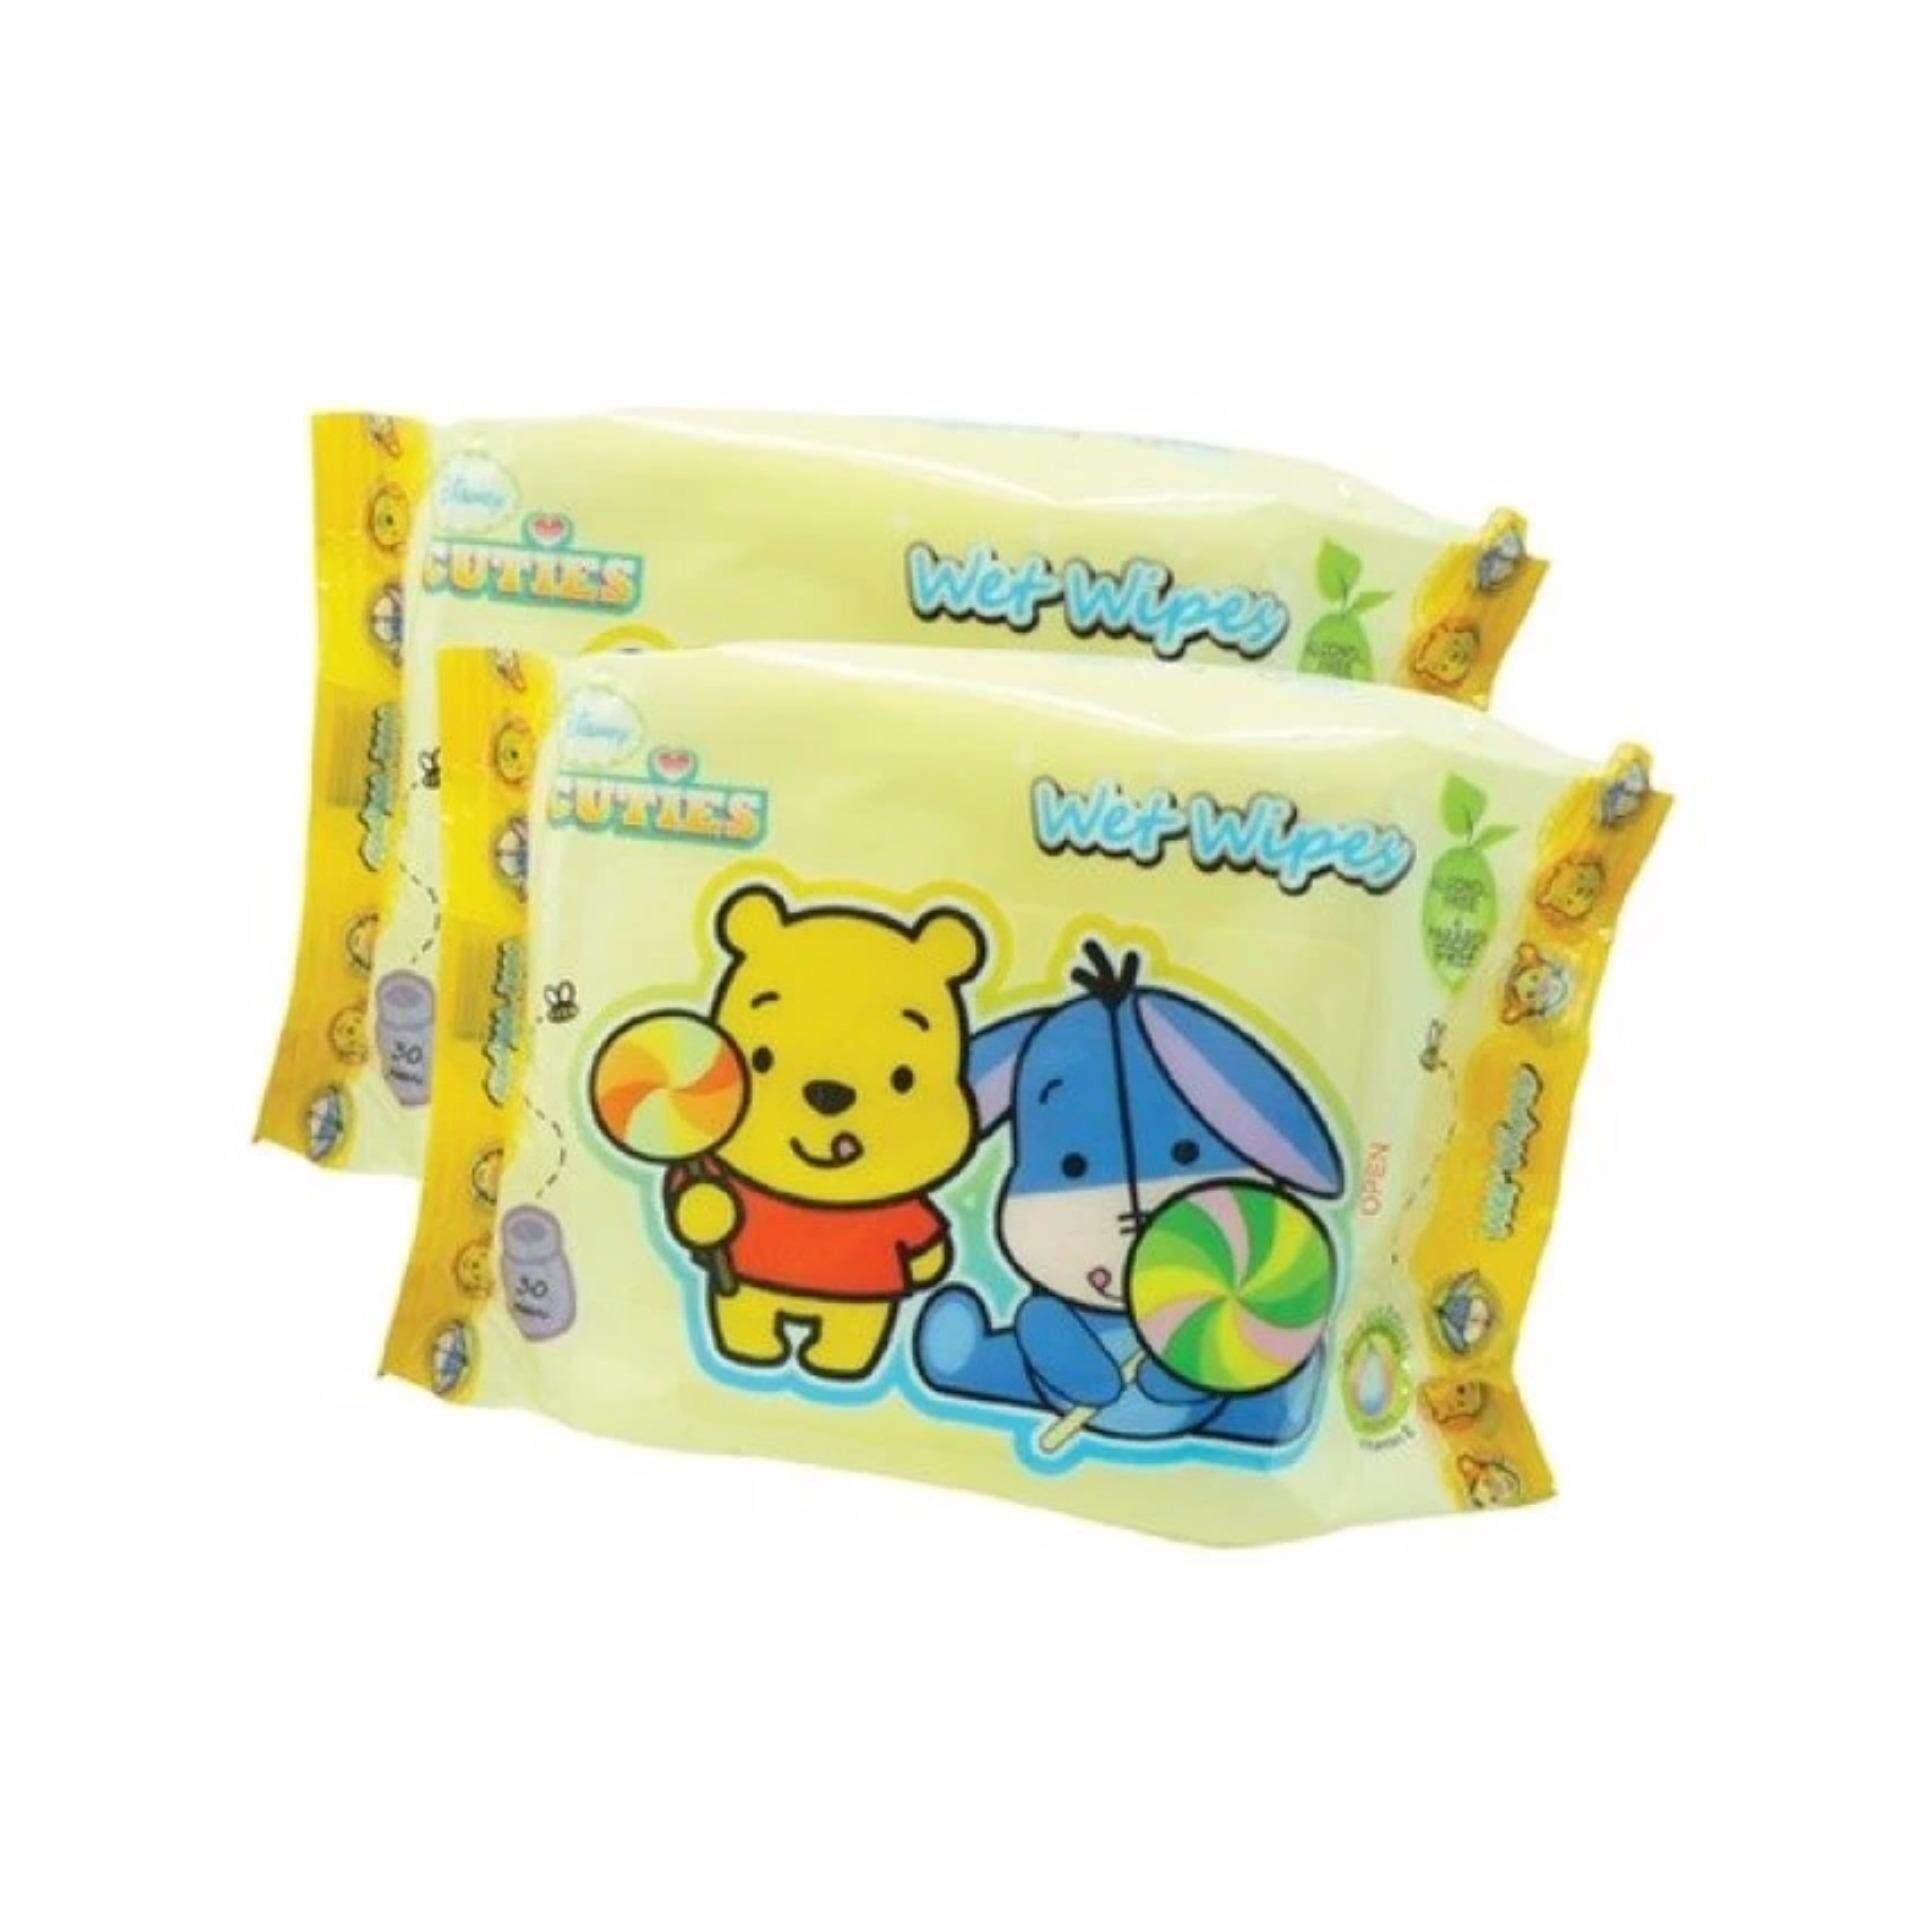 Disney Cuties Baby Wet Wipes Convenient Pack 10 x 30's Bundle Deals